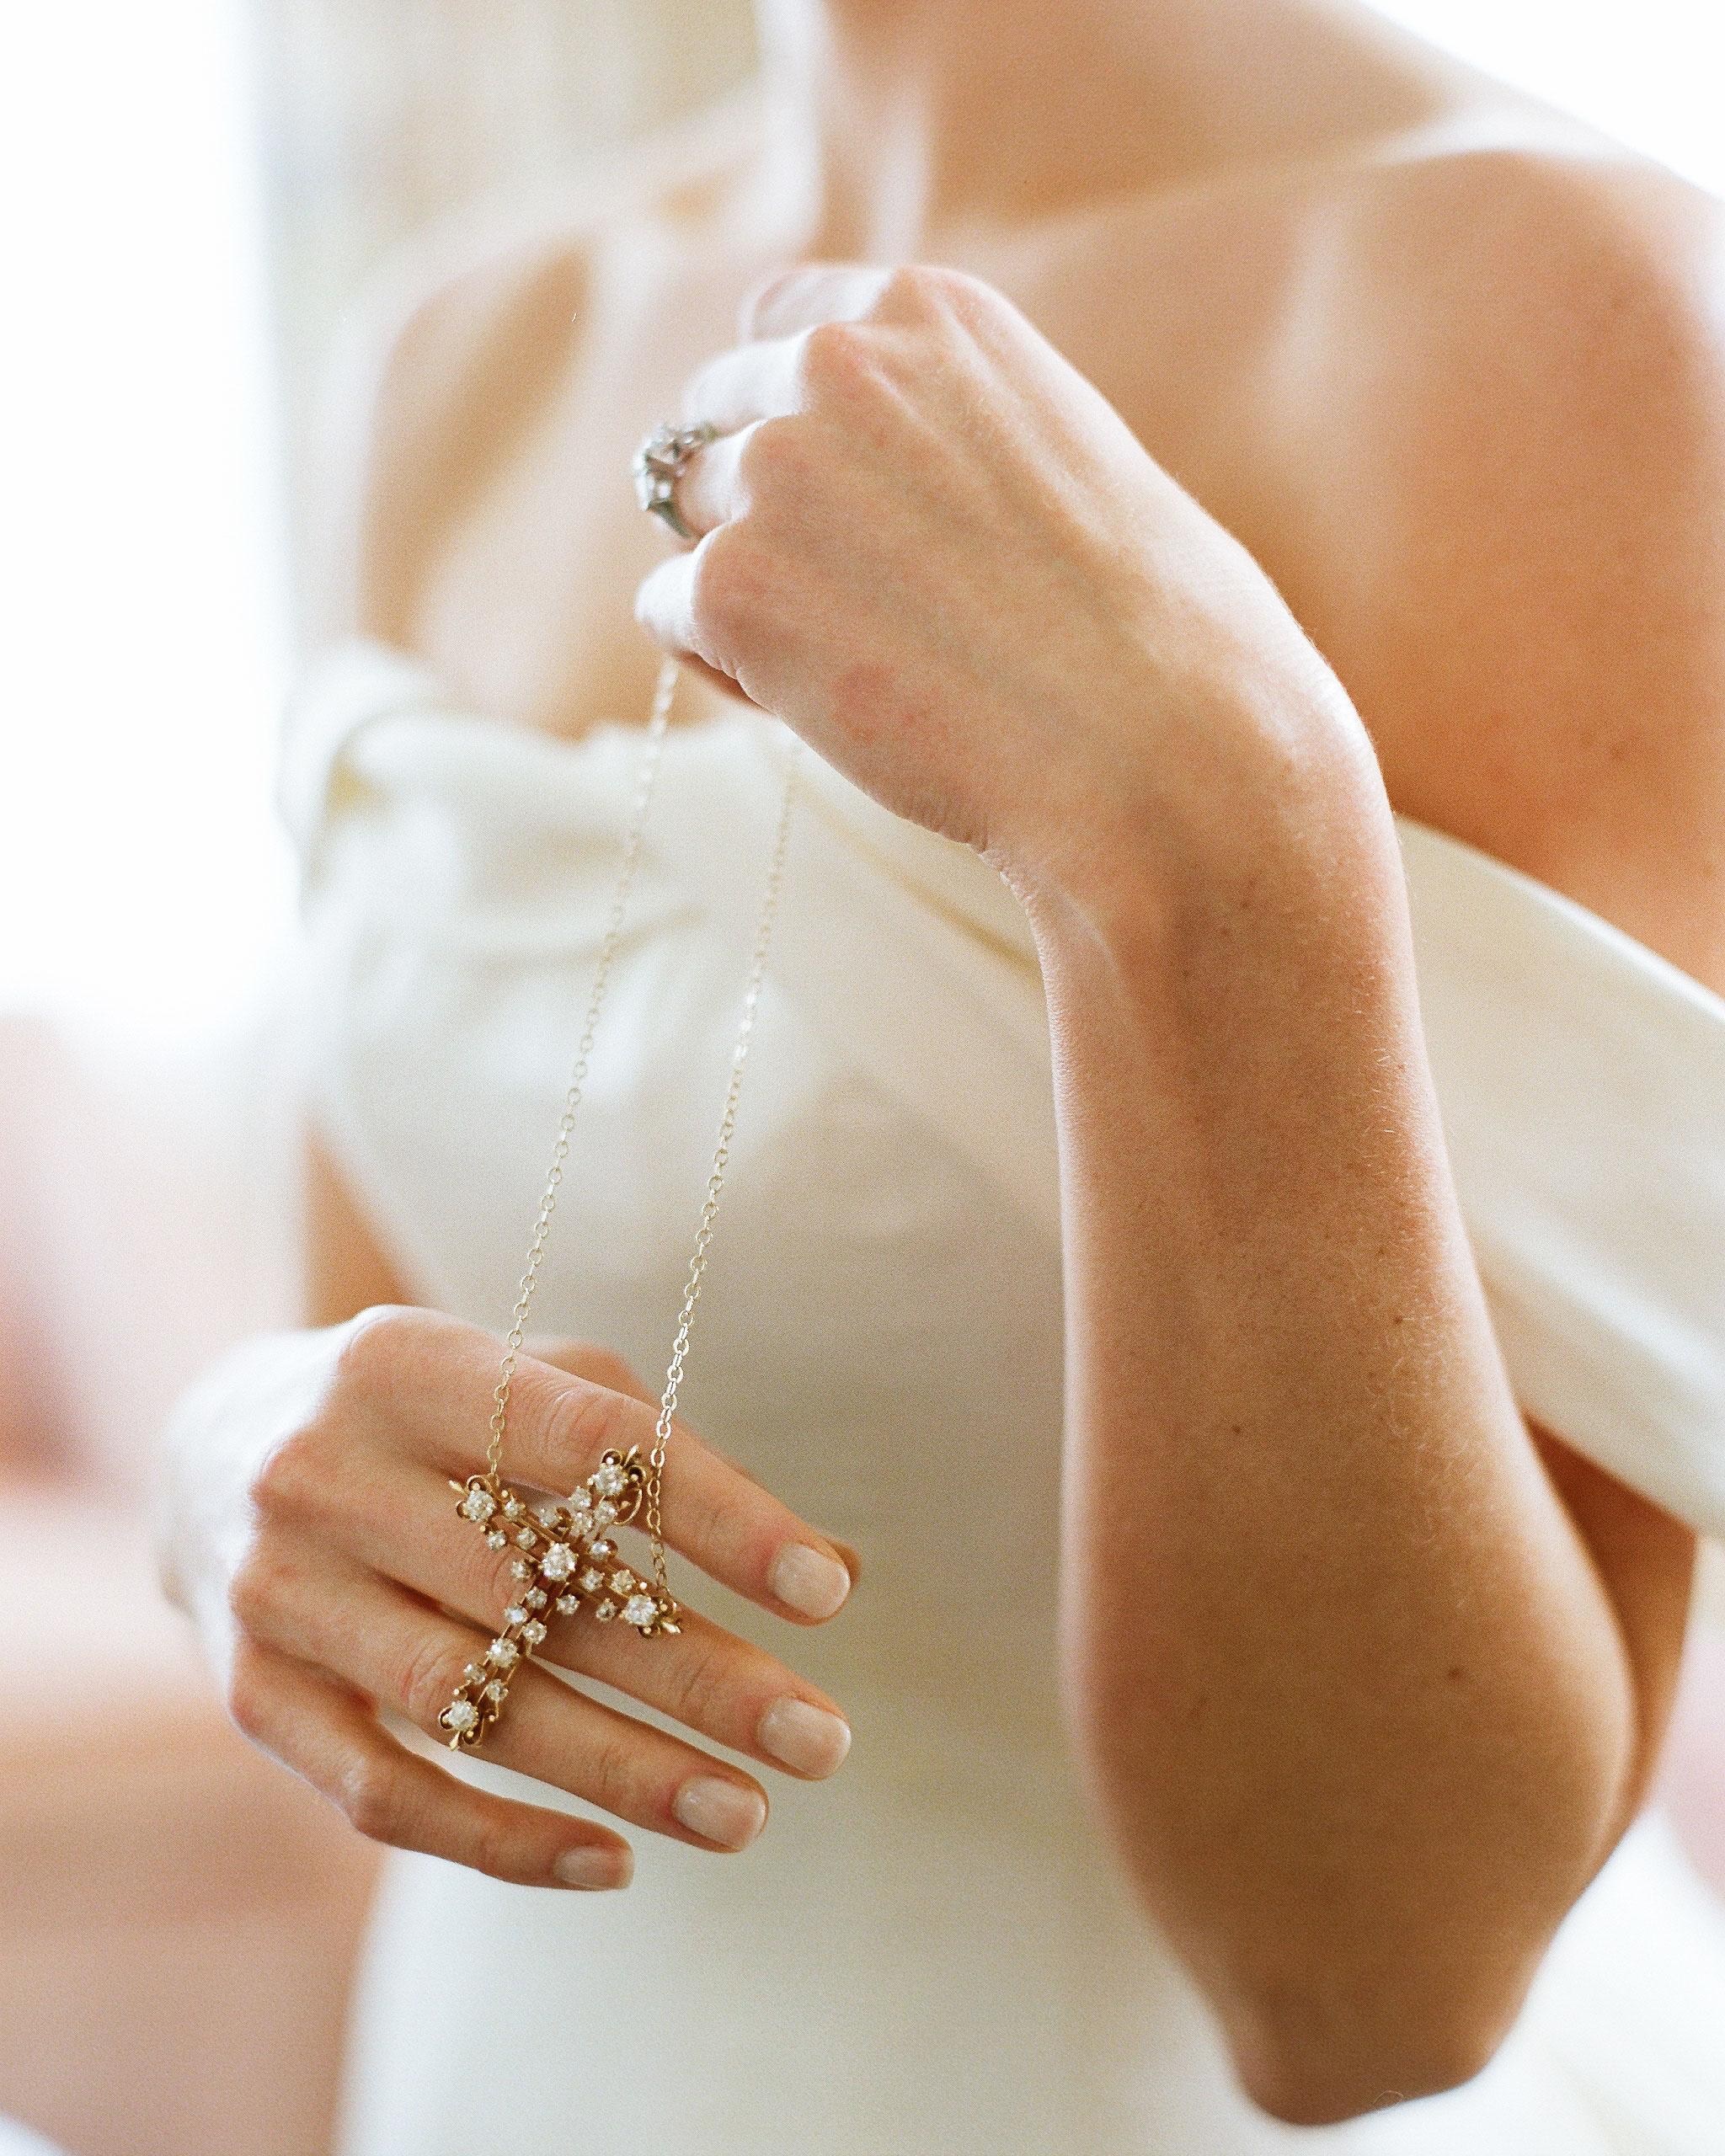 nancy-nathan-wedding-cross-0514-6141569-0816.jpg